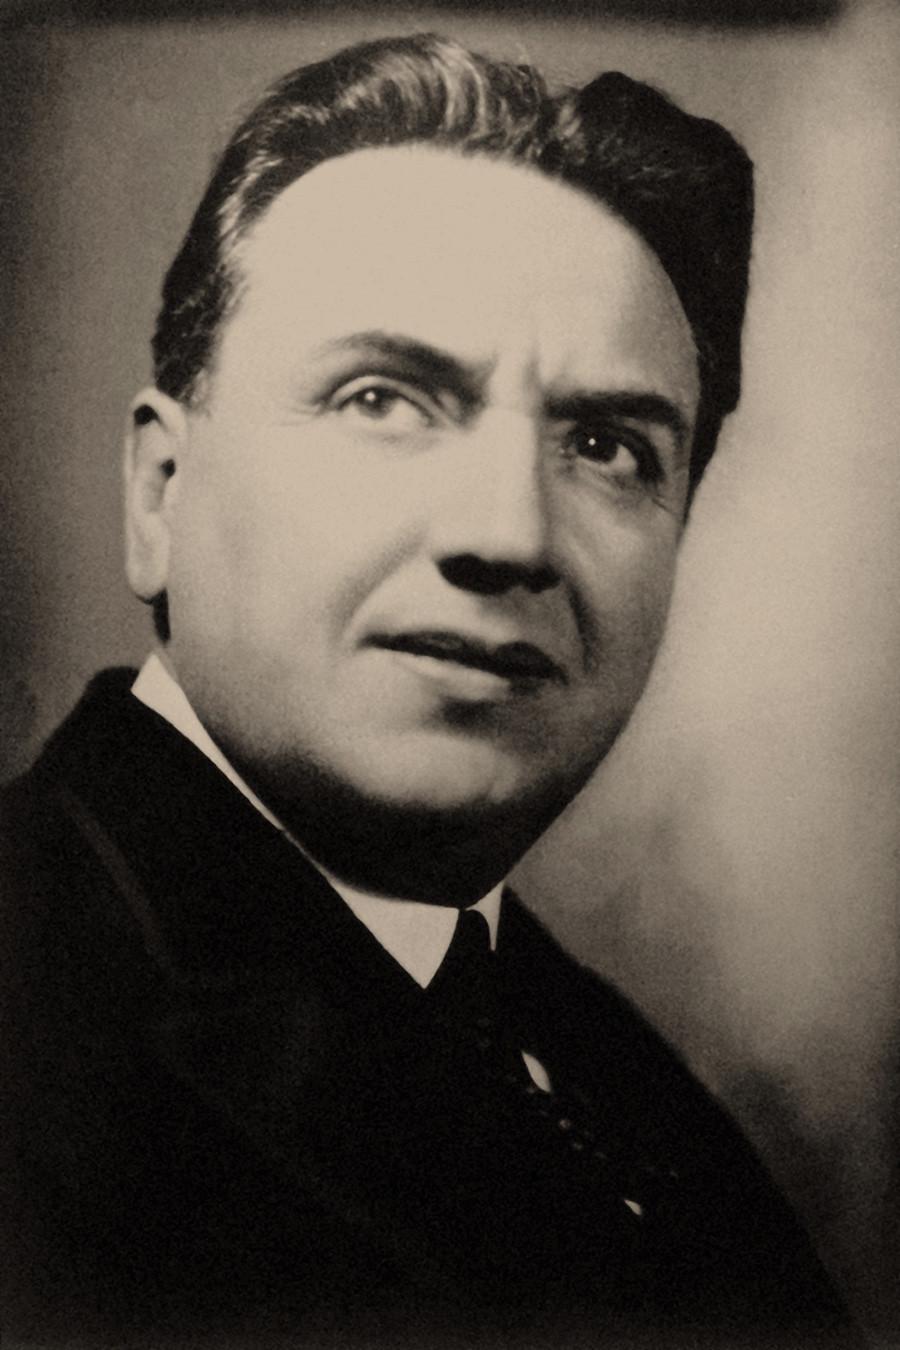 Ernest Beaux (1881-1961) na década de 1920.